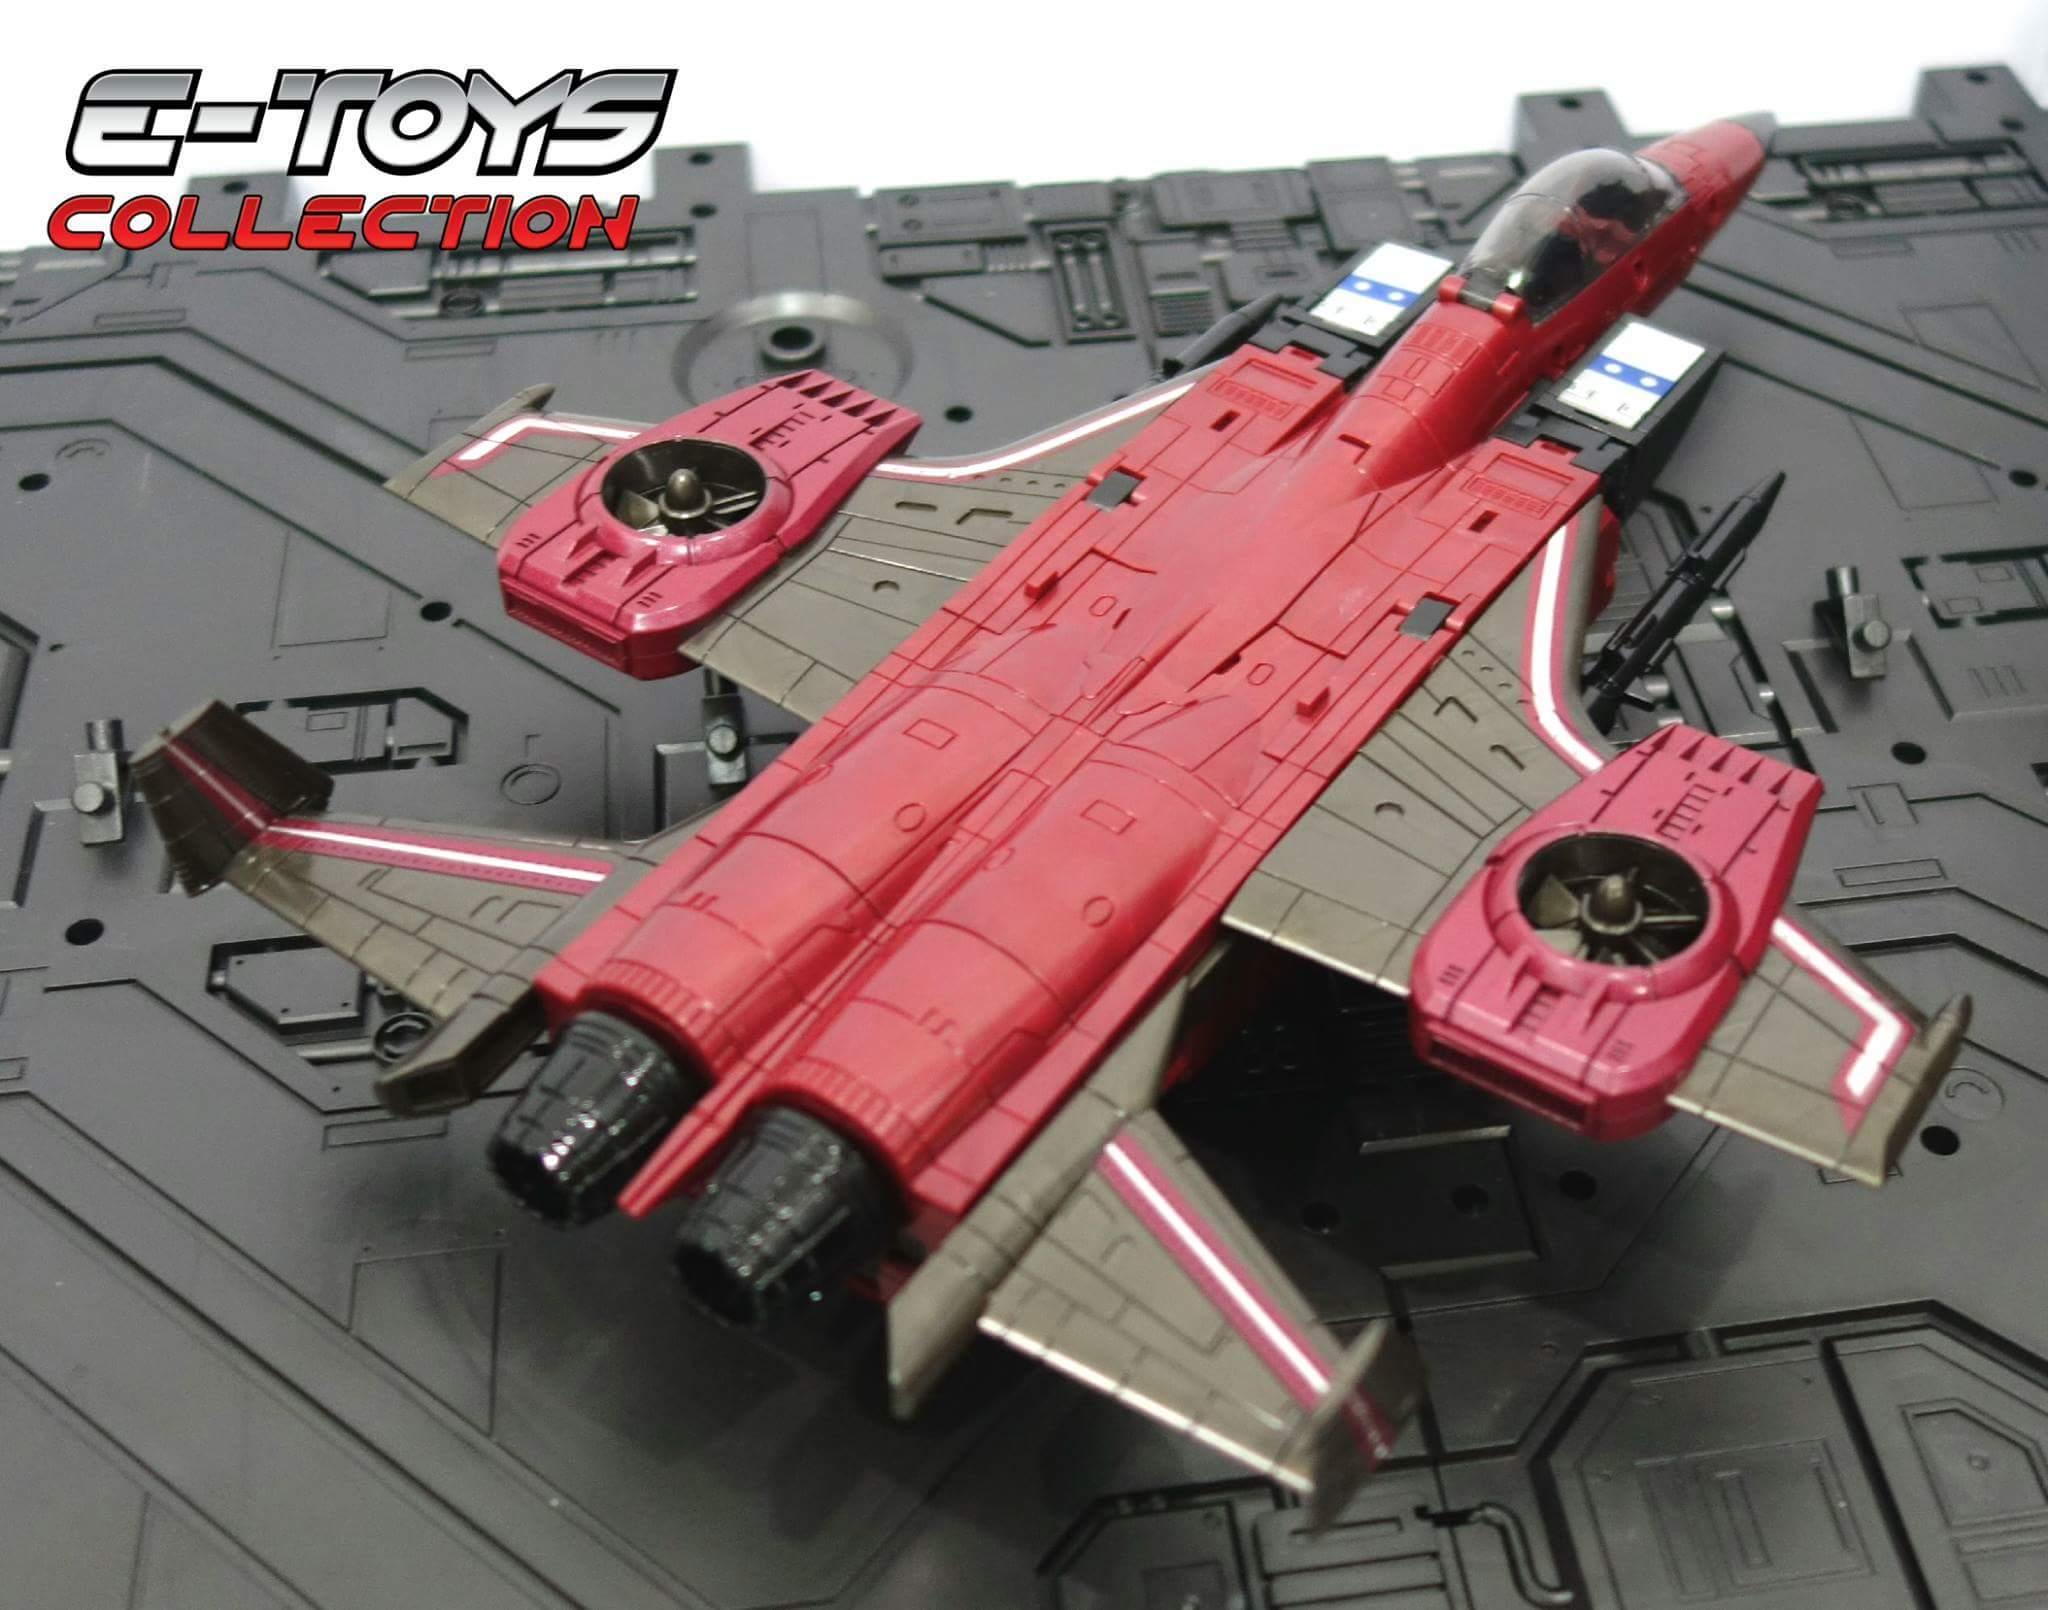 [ToyWorld] Produit Tiers - TW-M02A Combustor (Ramjet/Statoréacto), TW-M02B Assault (Thrust/Fatalo), TW-M02C Requiem (Dirge/Funébro) - Page 3 PgXC1TJR